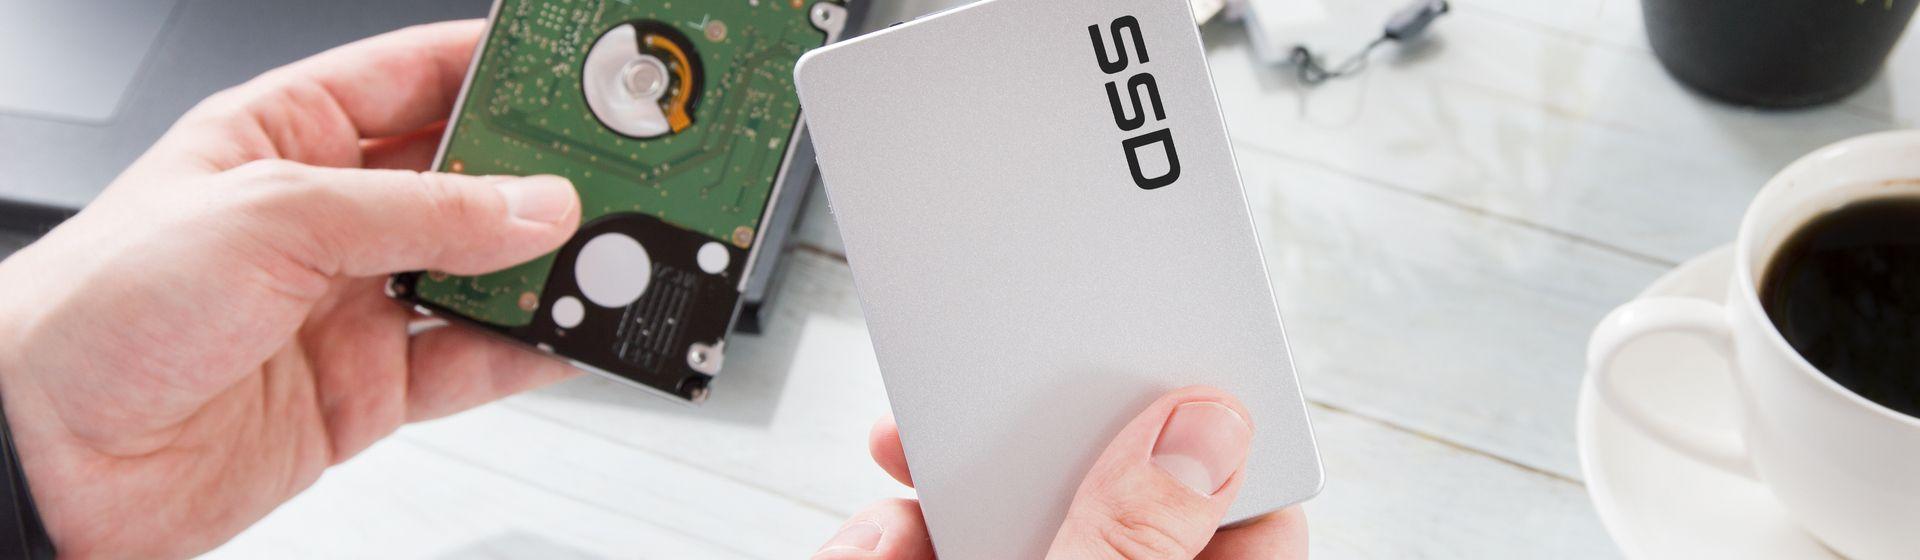 Como deixar o notebook mais rápido?